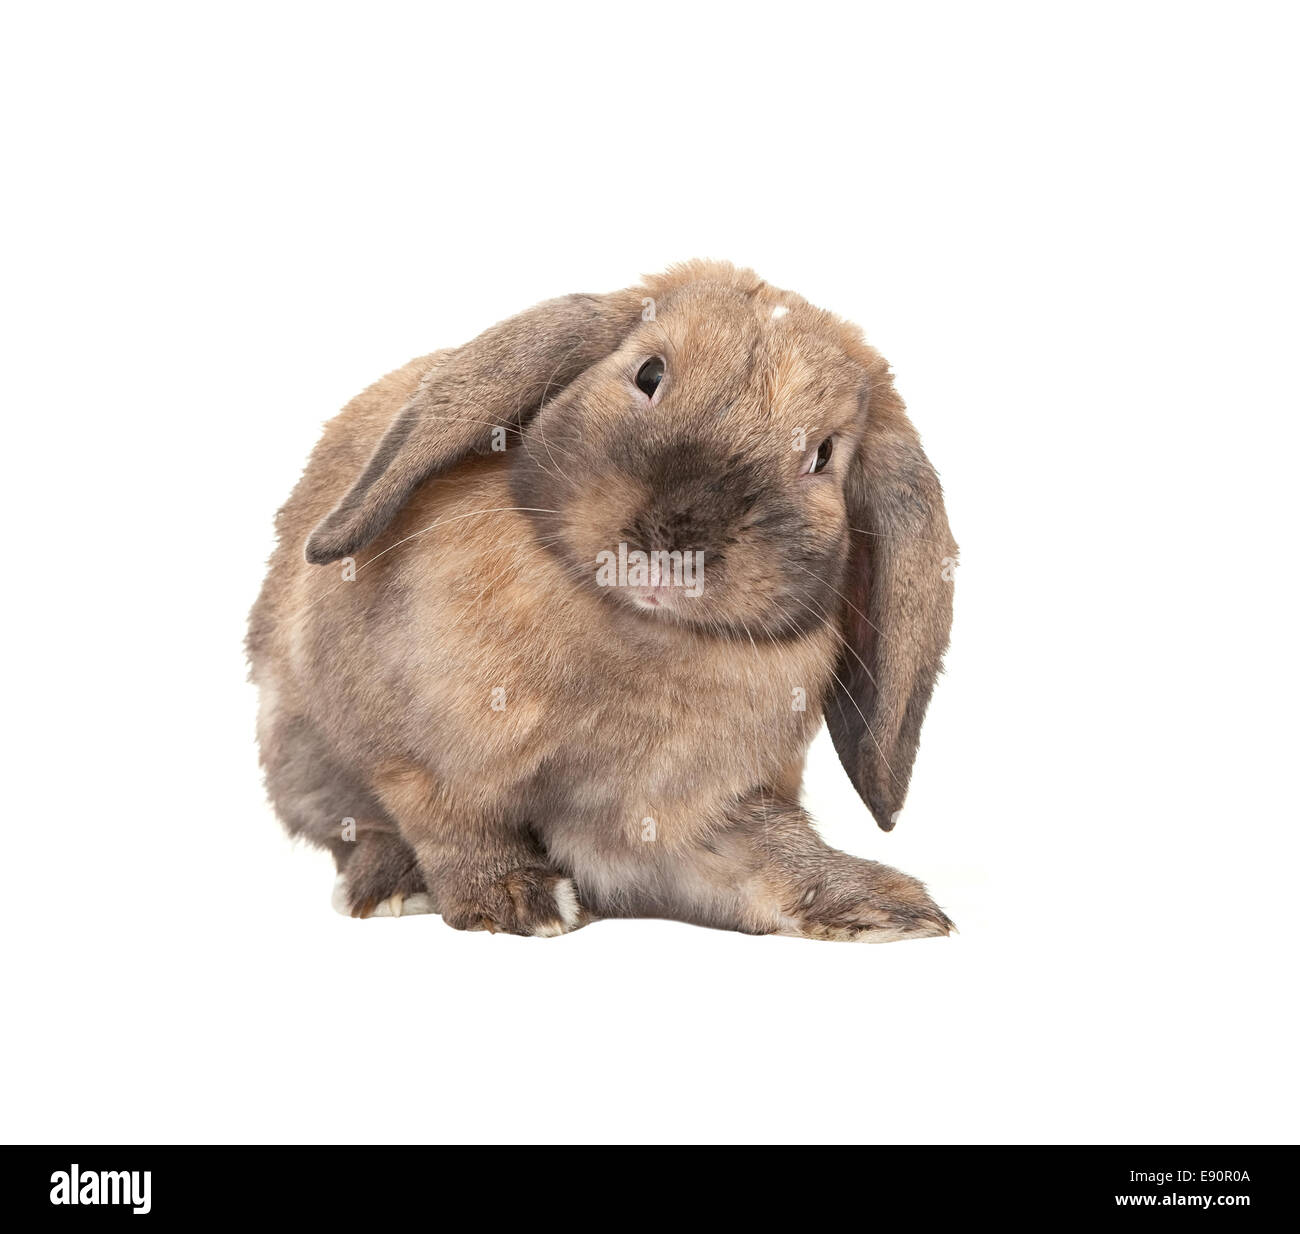 Rabbits are rams. Dwarf Rabbit Ram: breed description 38